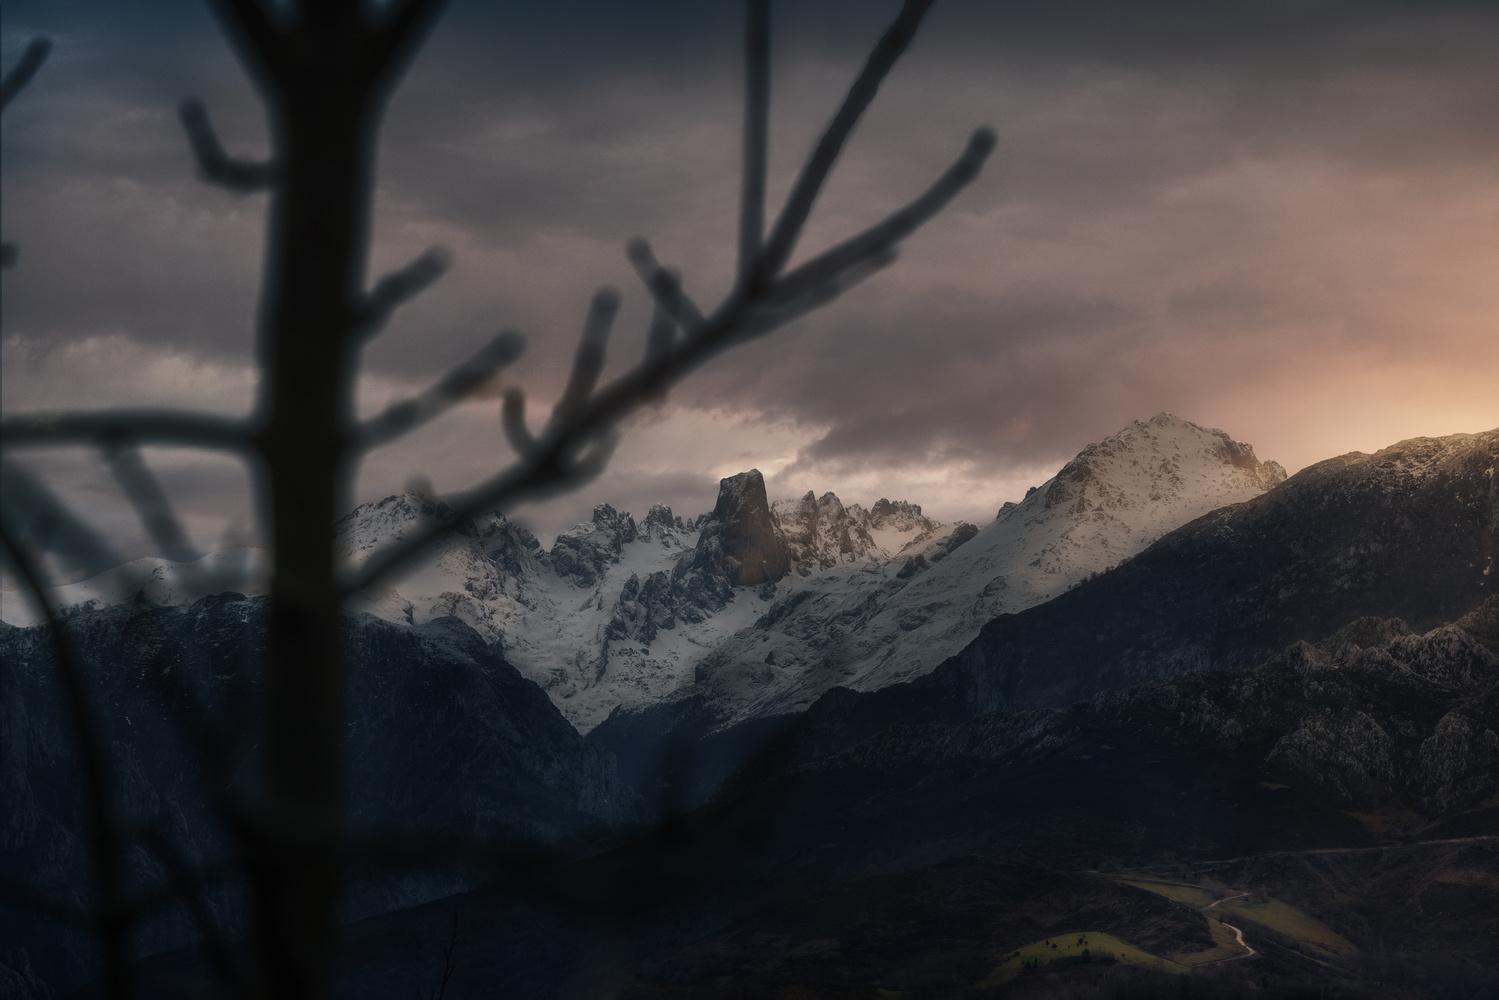 Last rays of light on Picu Urriellu by DaniGviews /Daniel